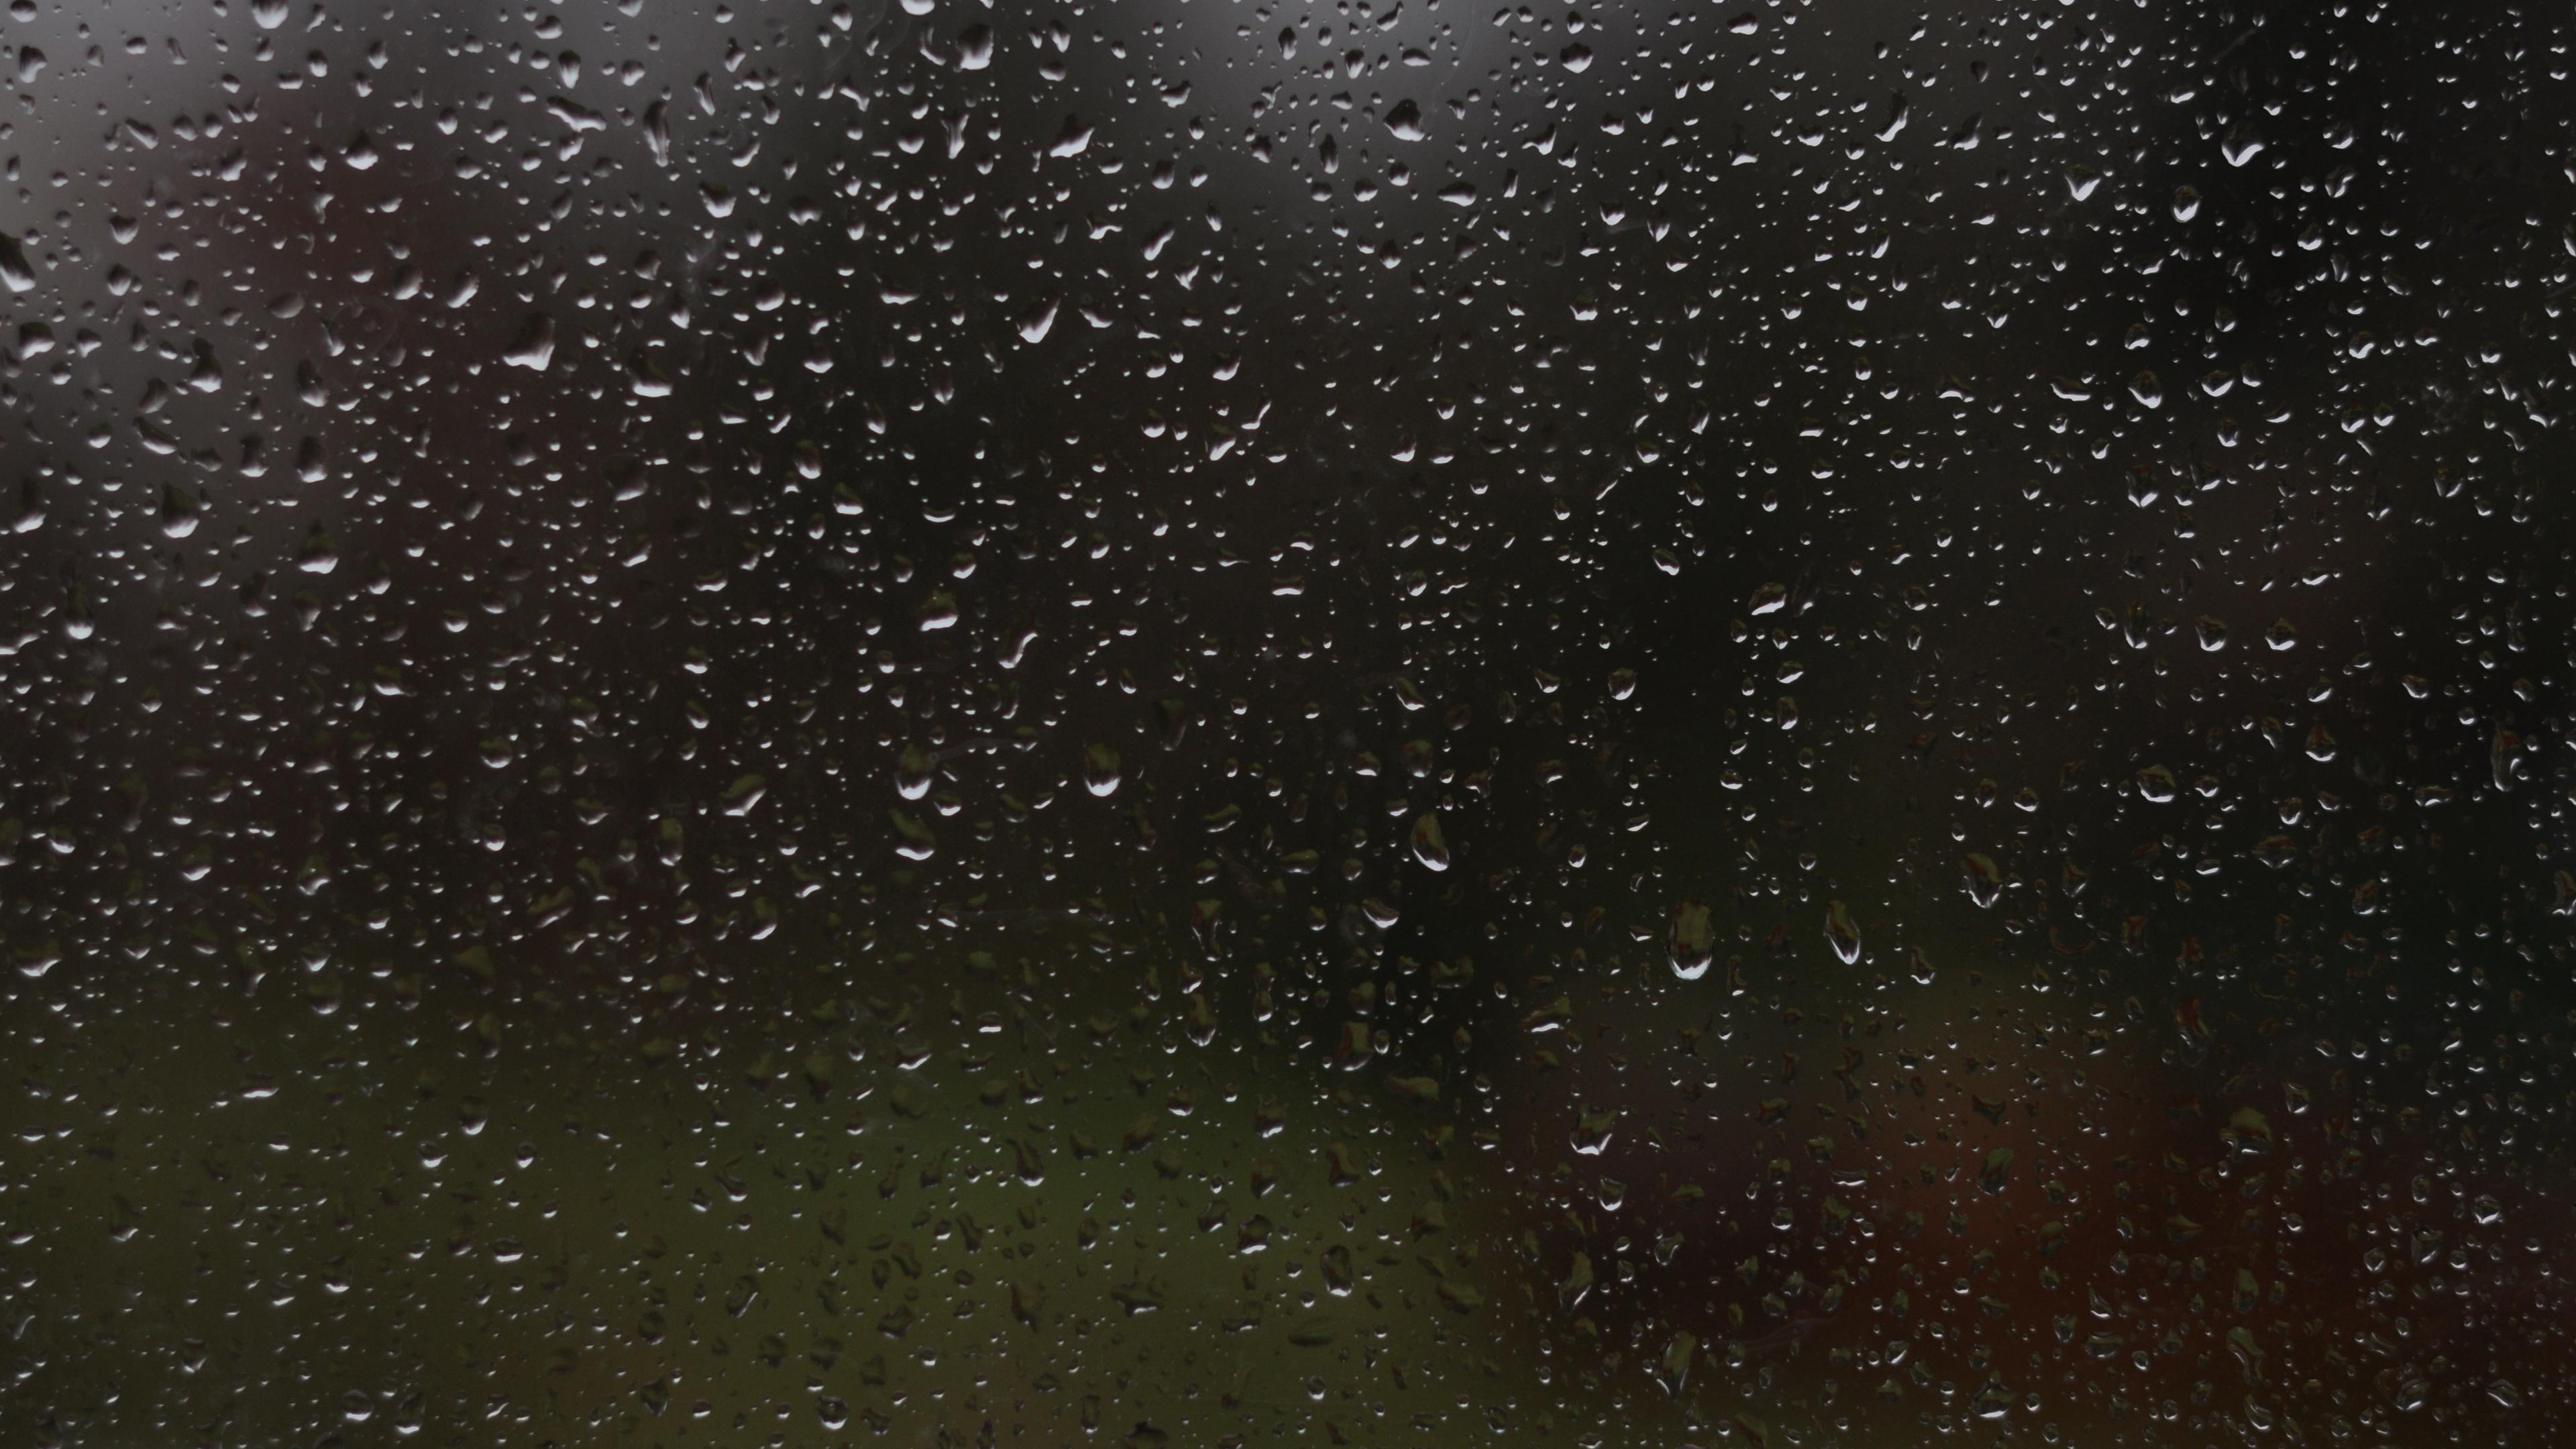 glass drops texture 4k 1536097847 - glass, drops, texture 4k - Texture, Glass, Drops